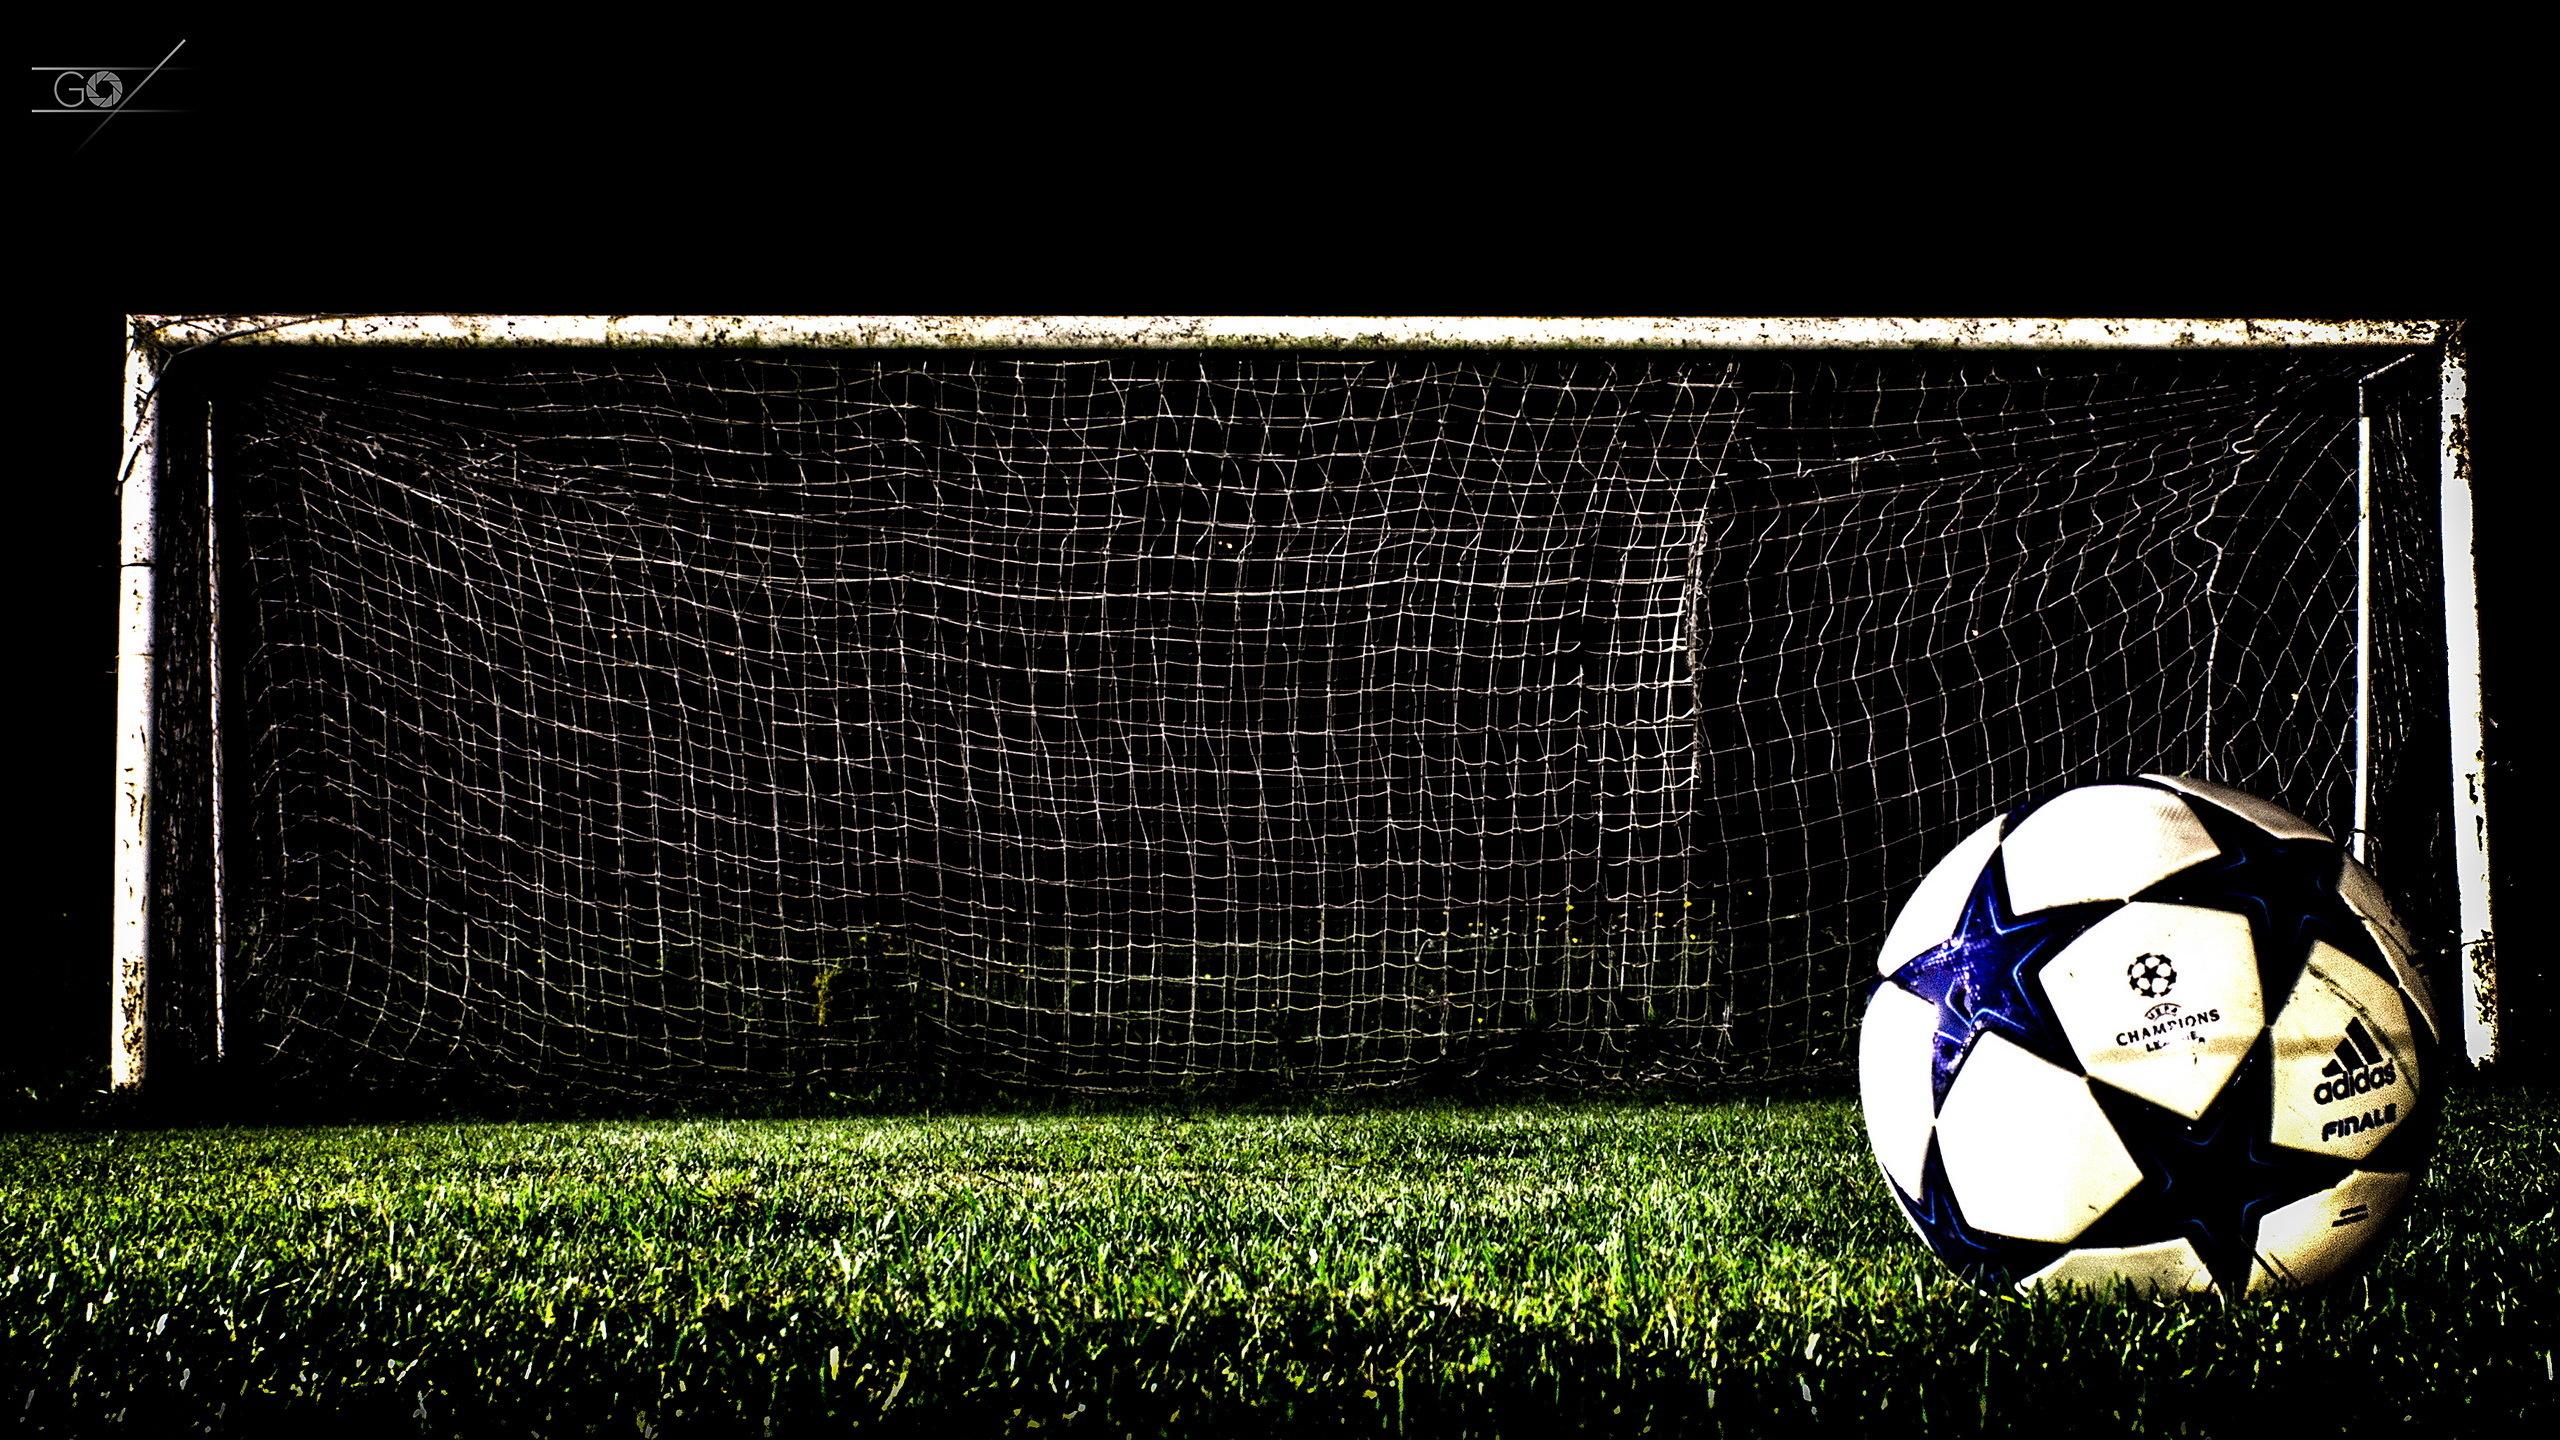 Fond d'écran - But - Football (2) - Fond d'écran HD